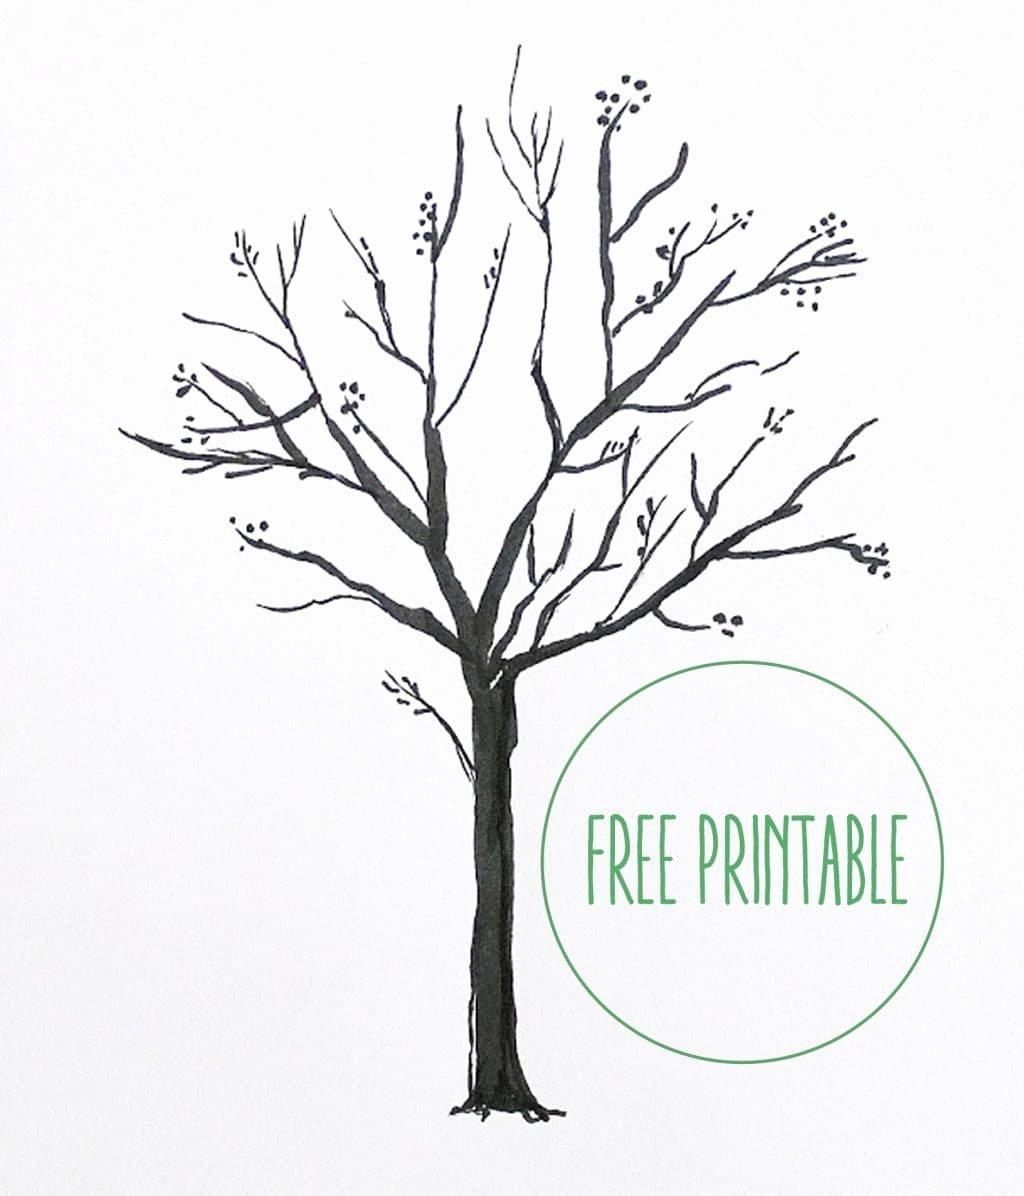 Family Tree Template Free New Free Printable